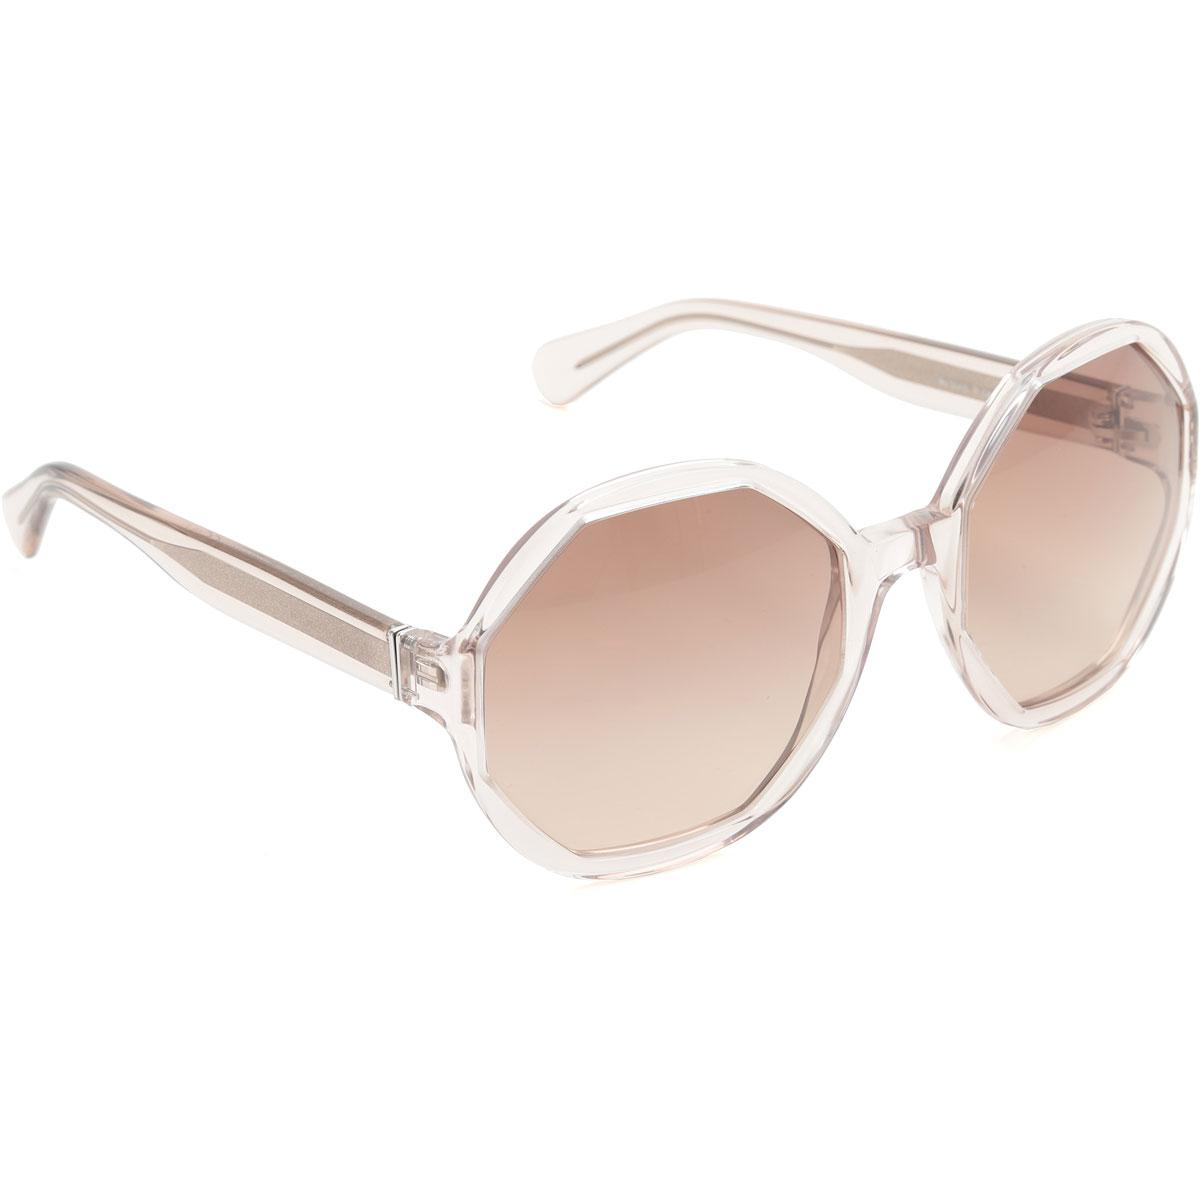 52ecff7f46 Lyst - Marc Jacobs Sunglasses On Sale